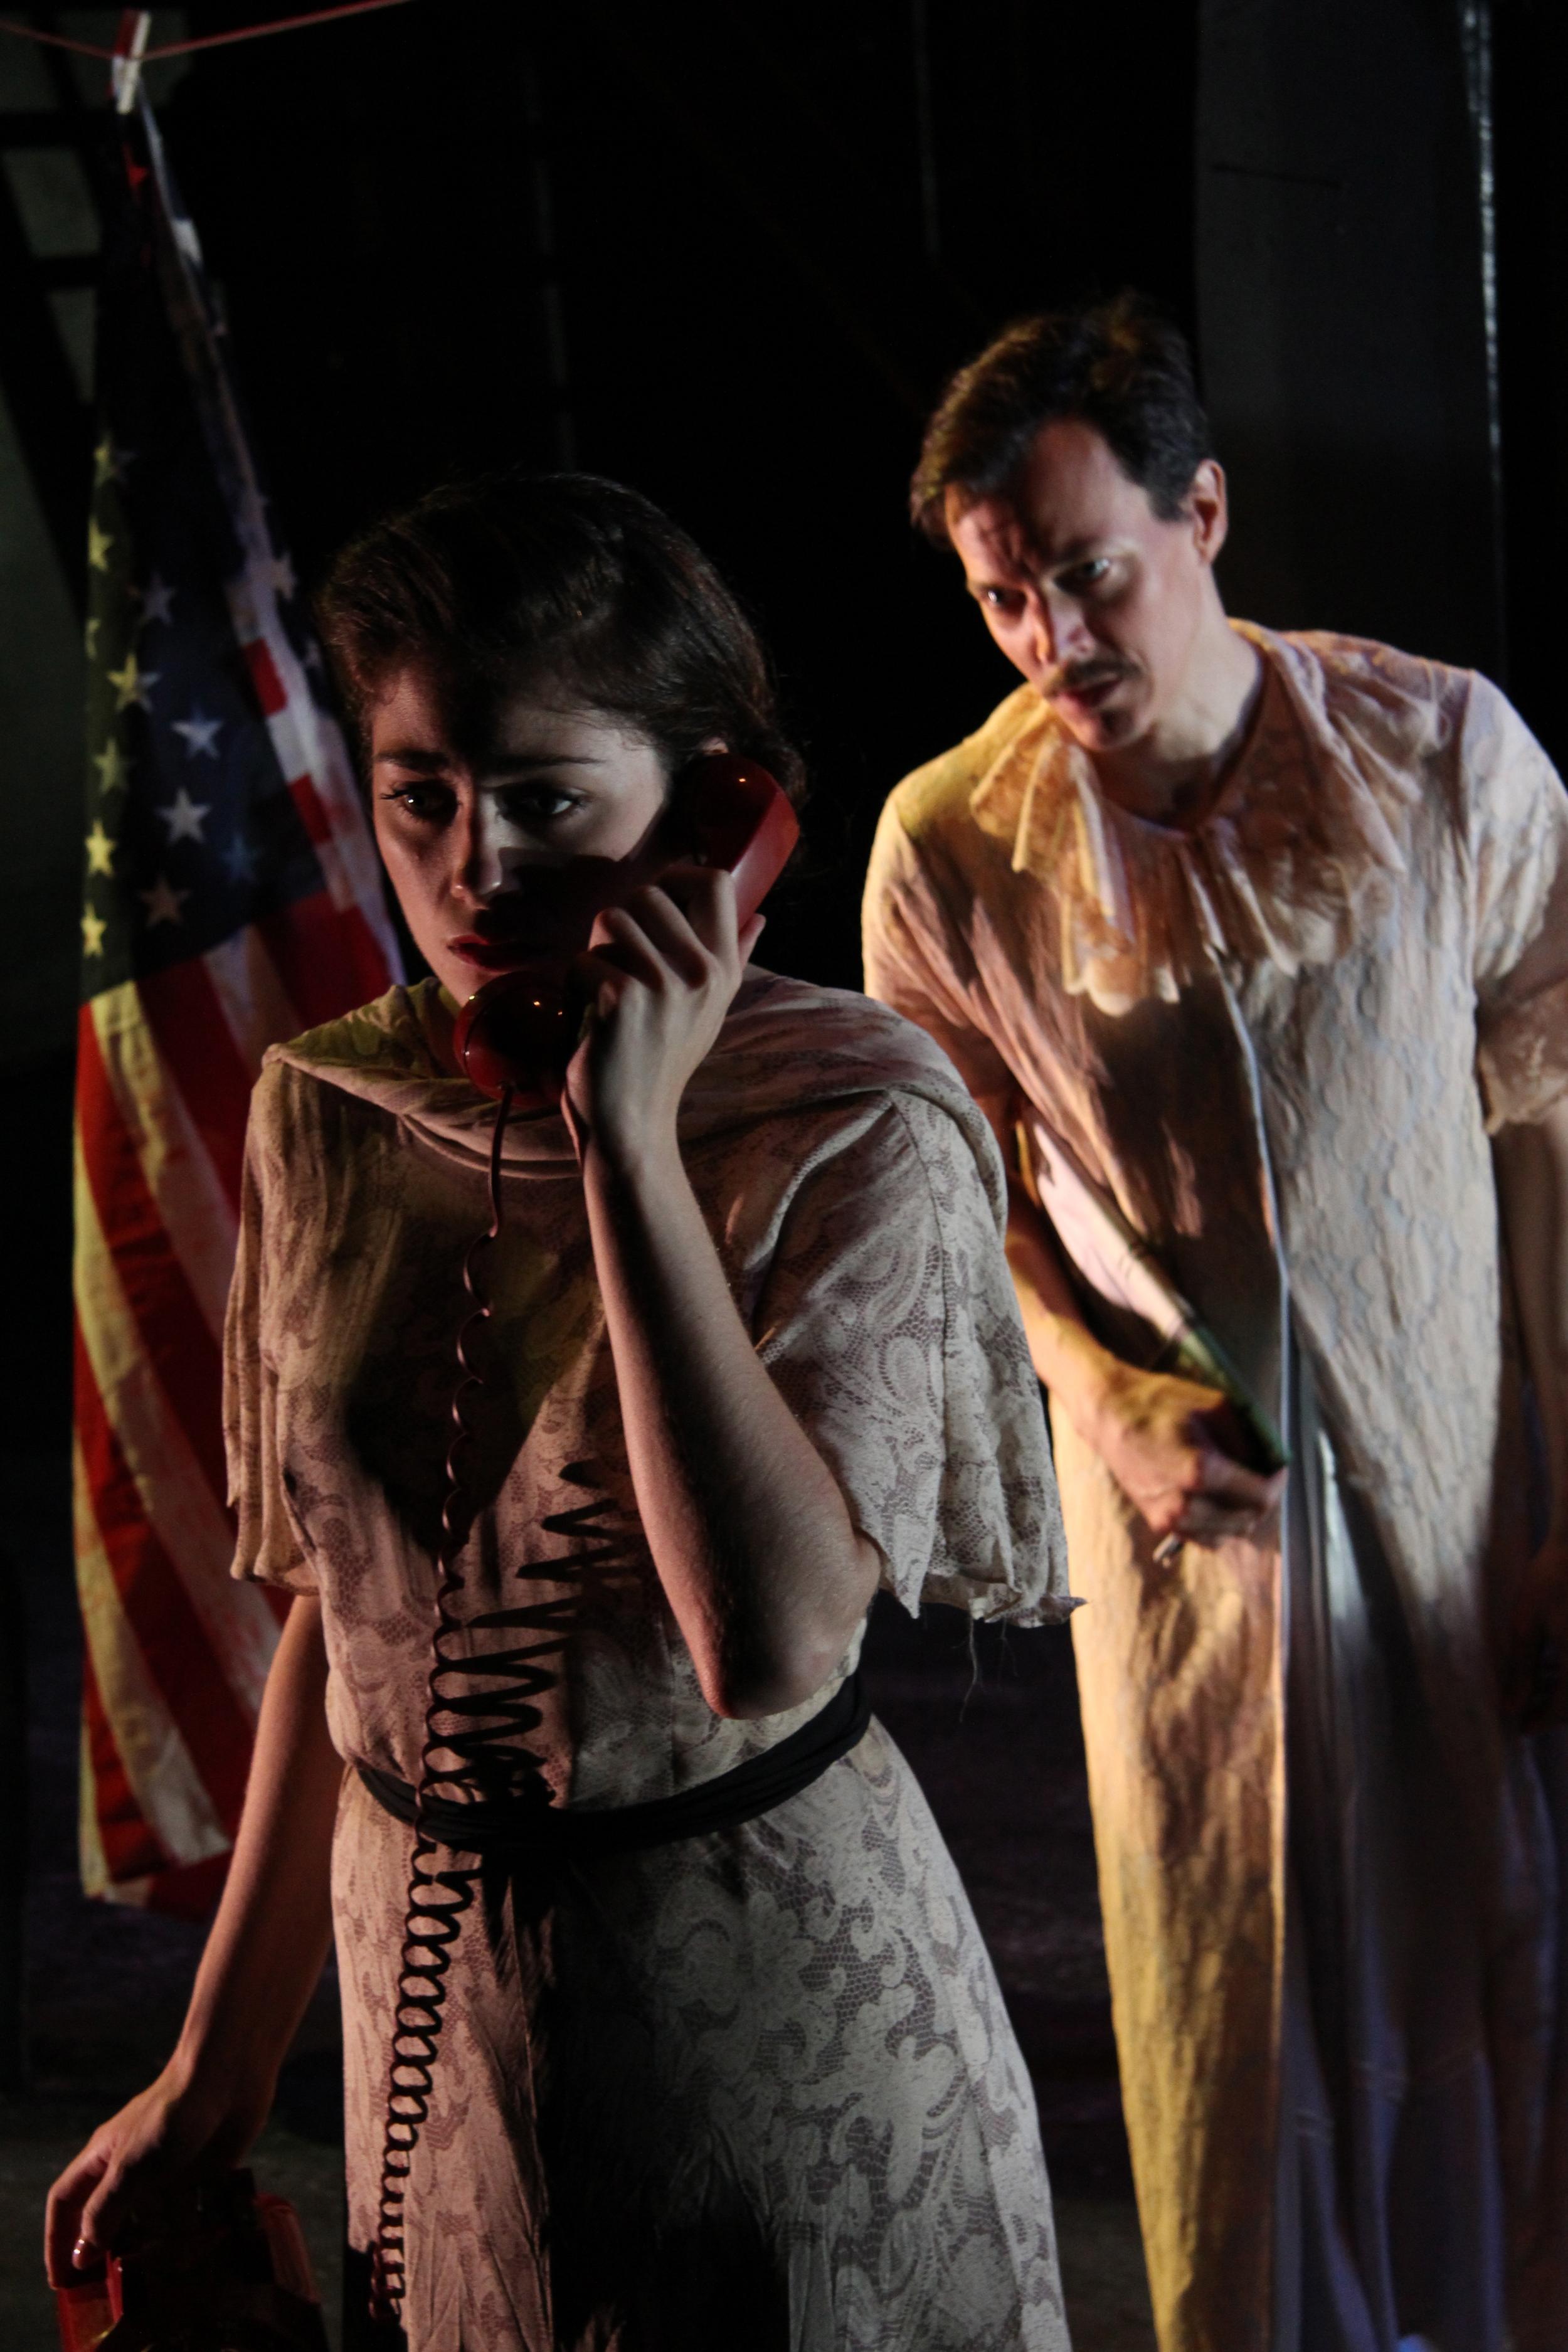 Elizabeth Elderfer and Daniel Allen Nelson. Photo by Josh Smith.